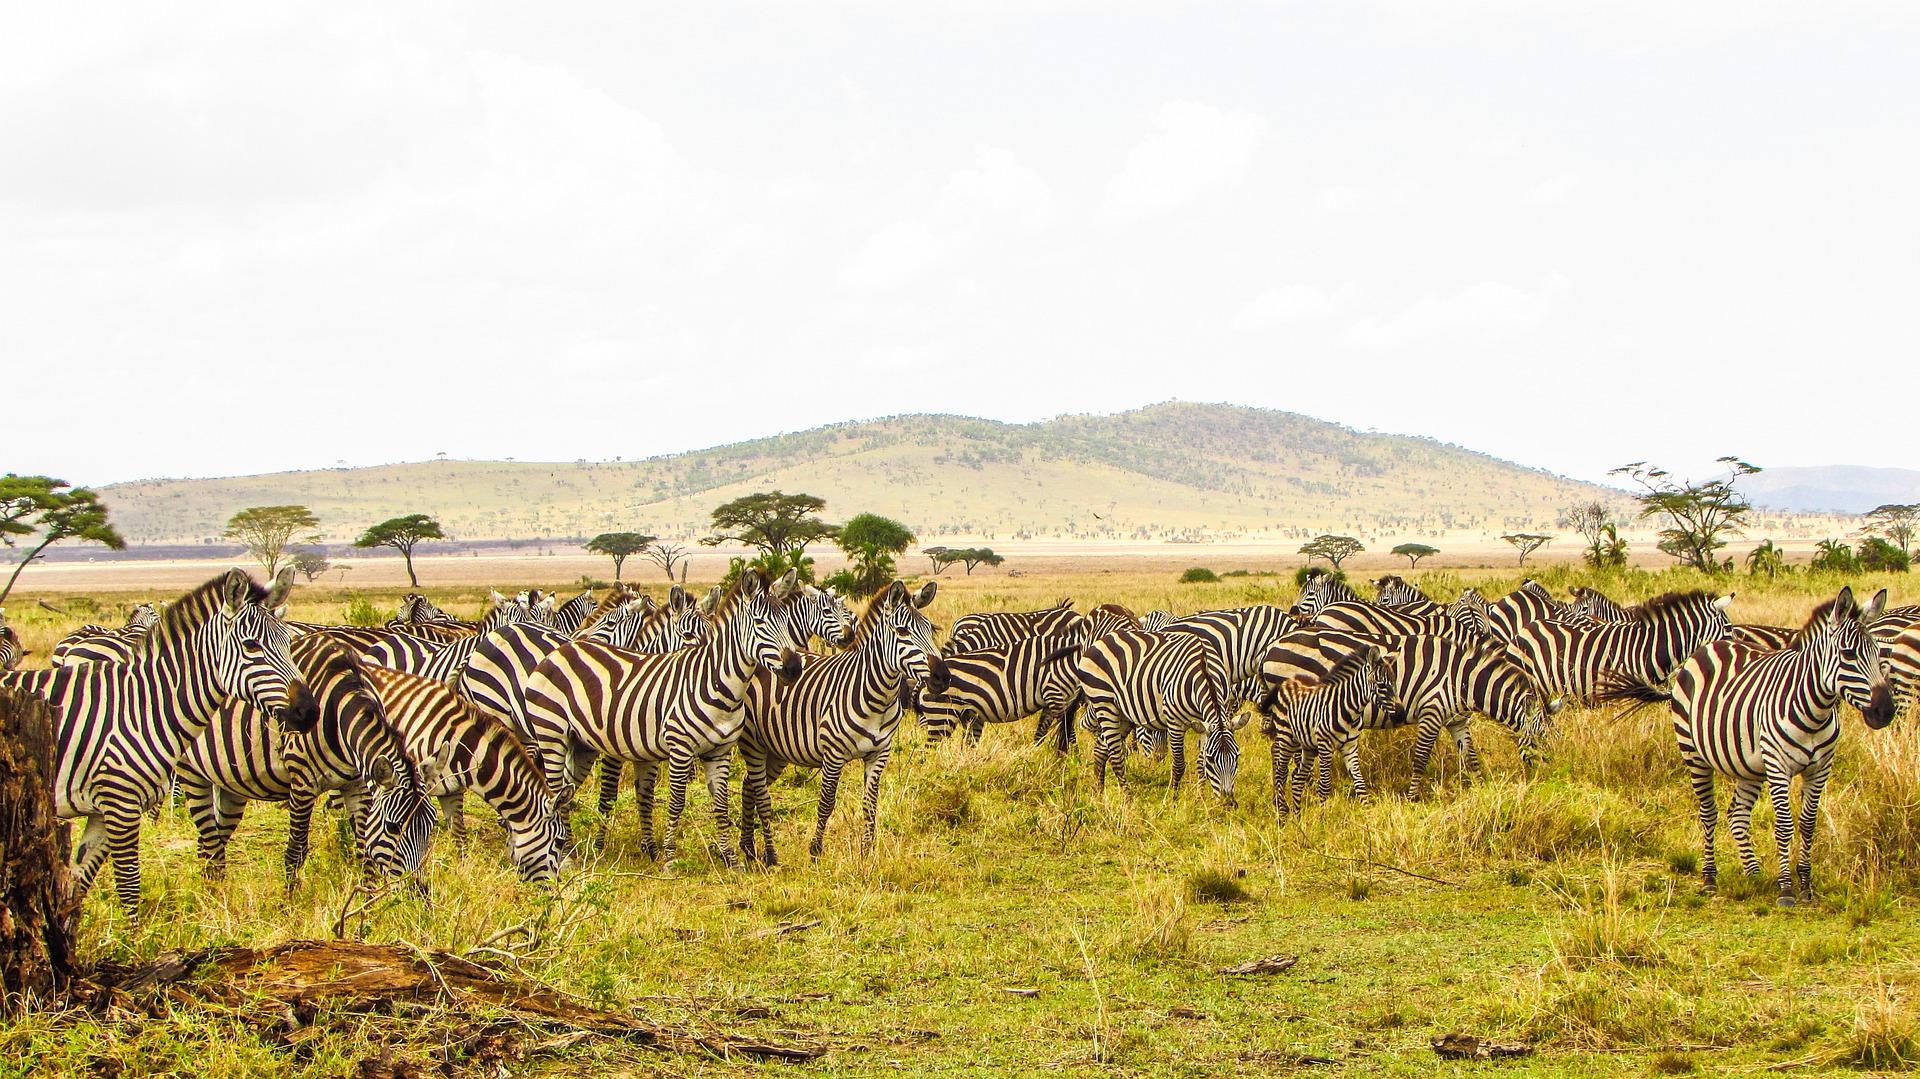 Тур-сафари в Танзании